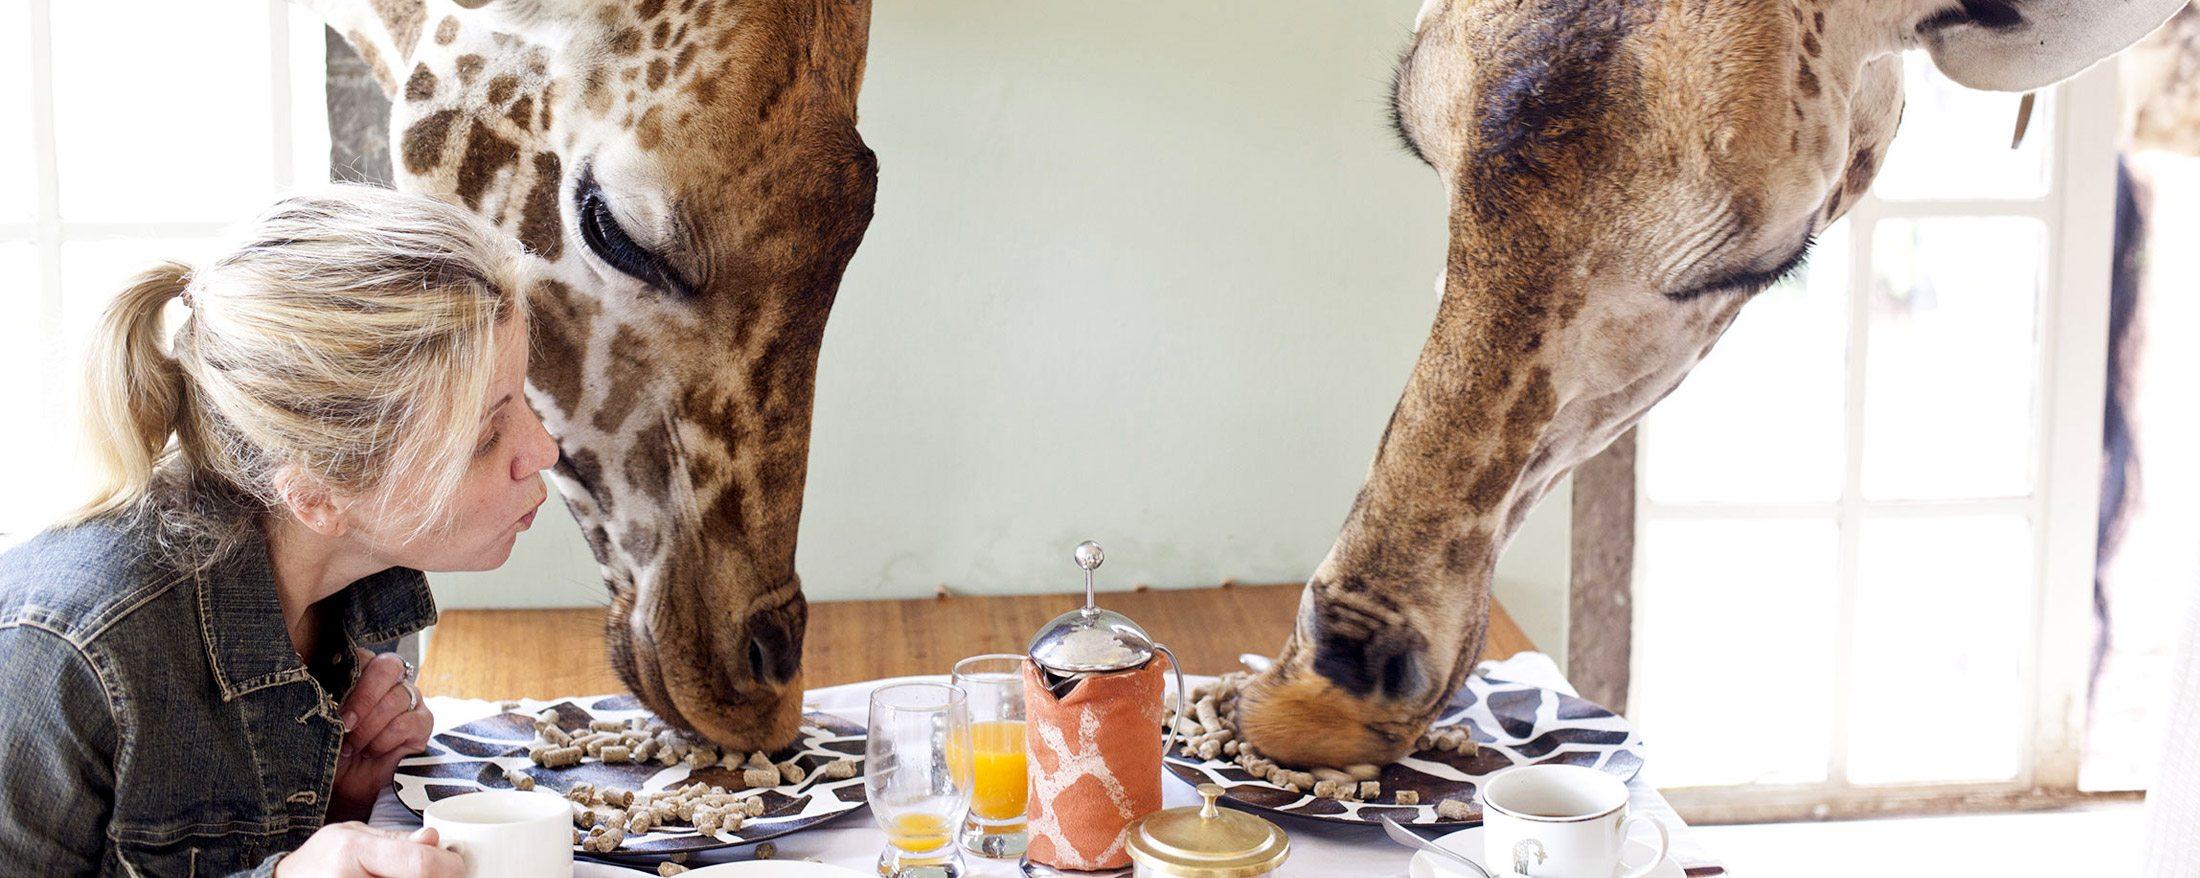 Breakfast with giraffe   The giraffe eat pellets right off your breakfast table at Giraffe Manor.